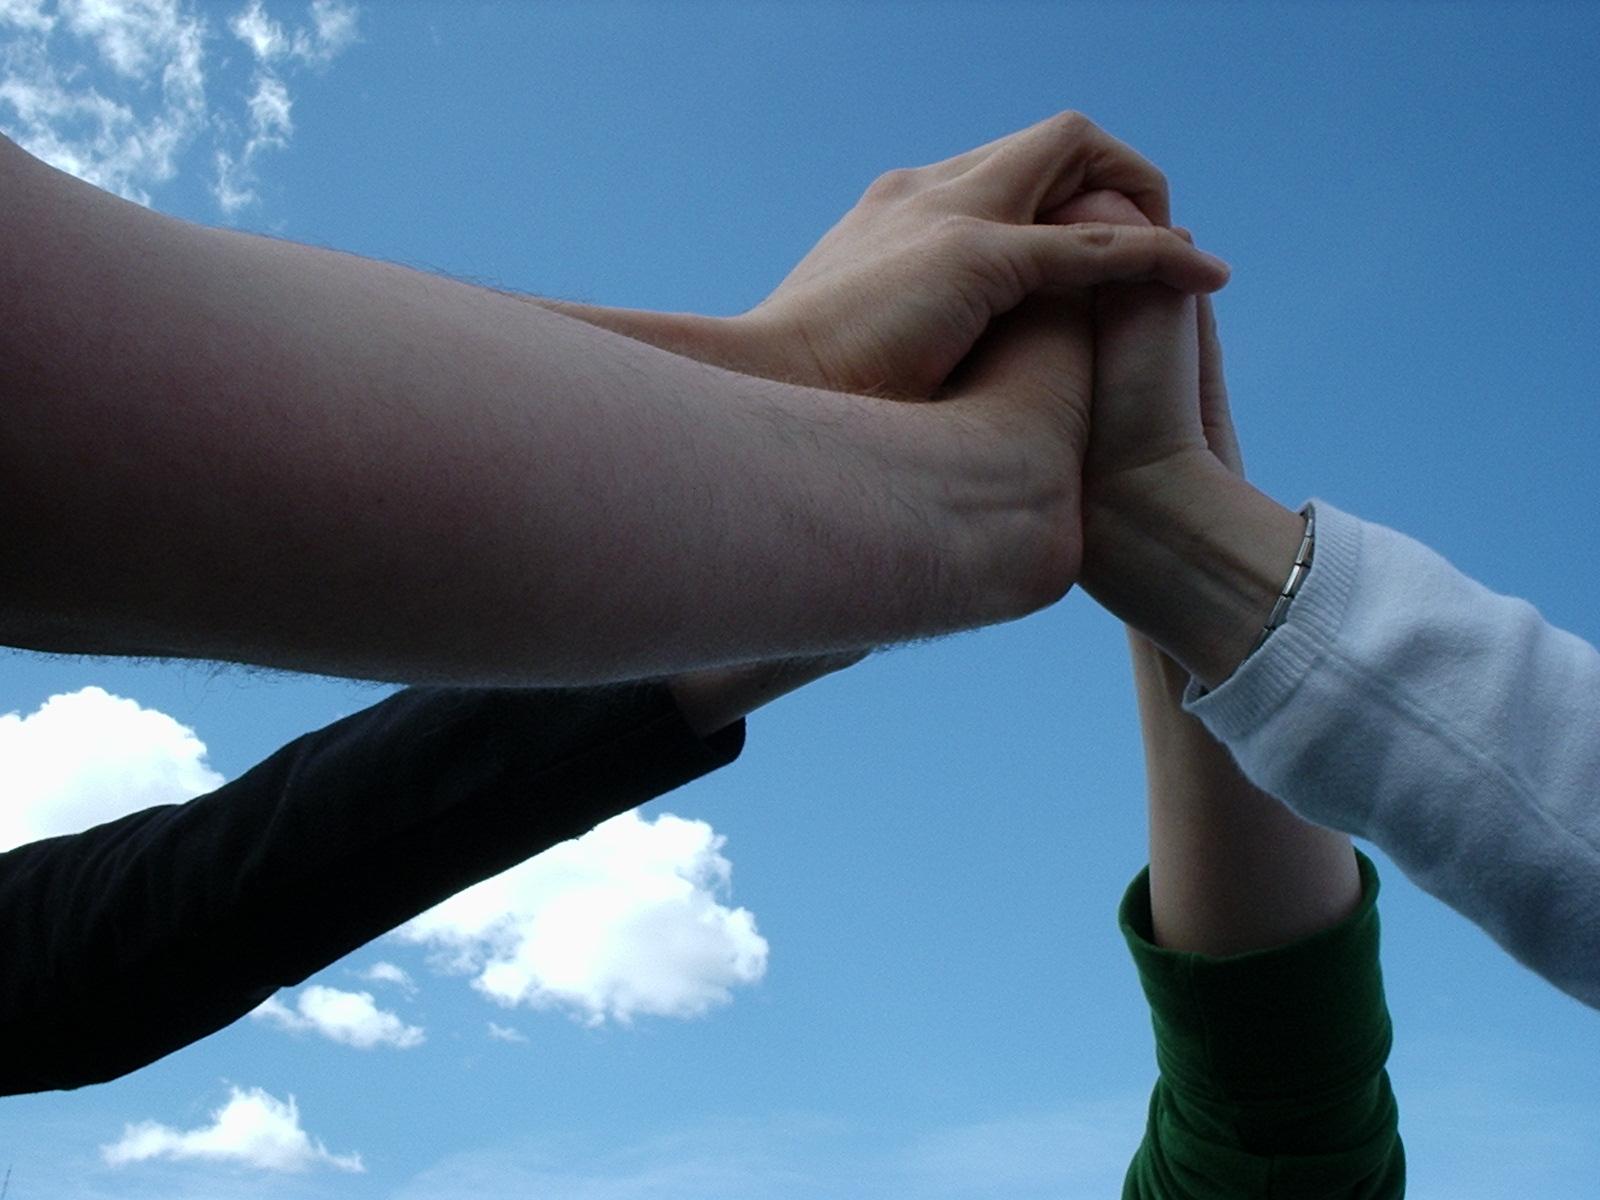 Fotografia de diverses mans unides